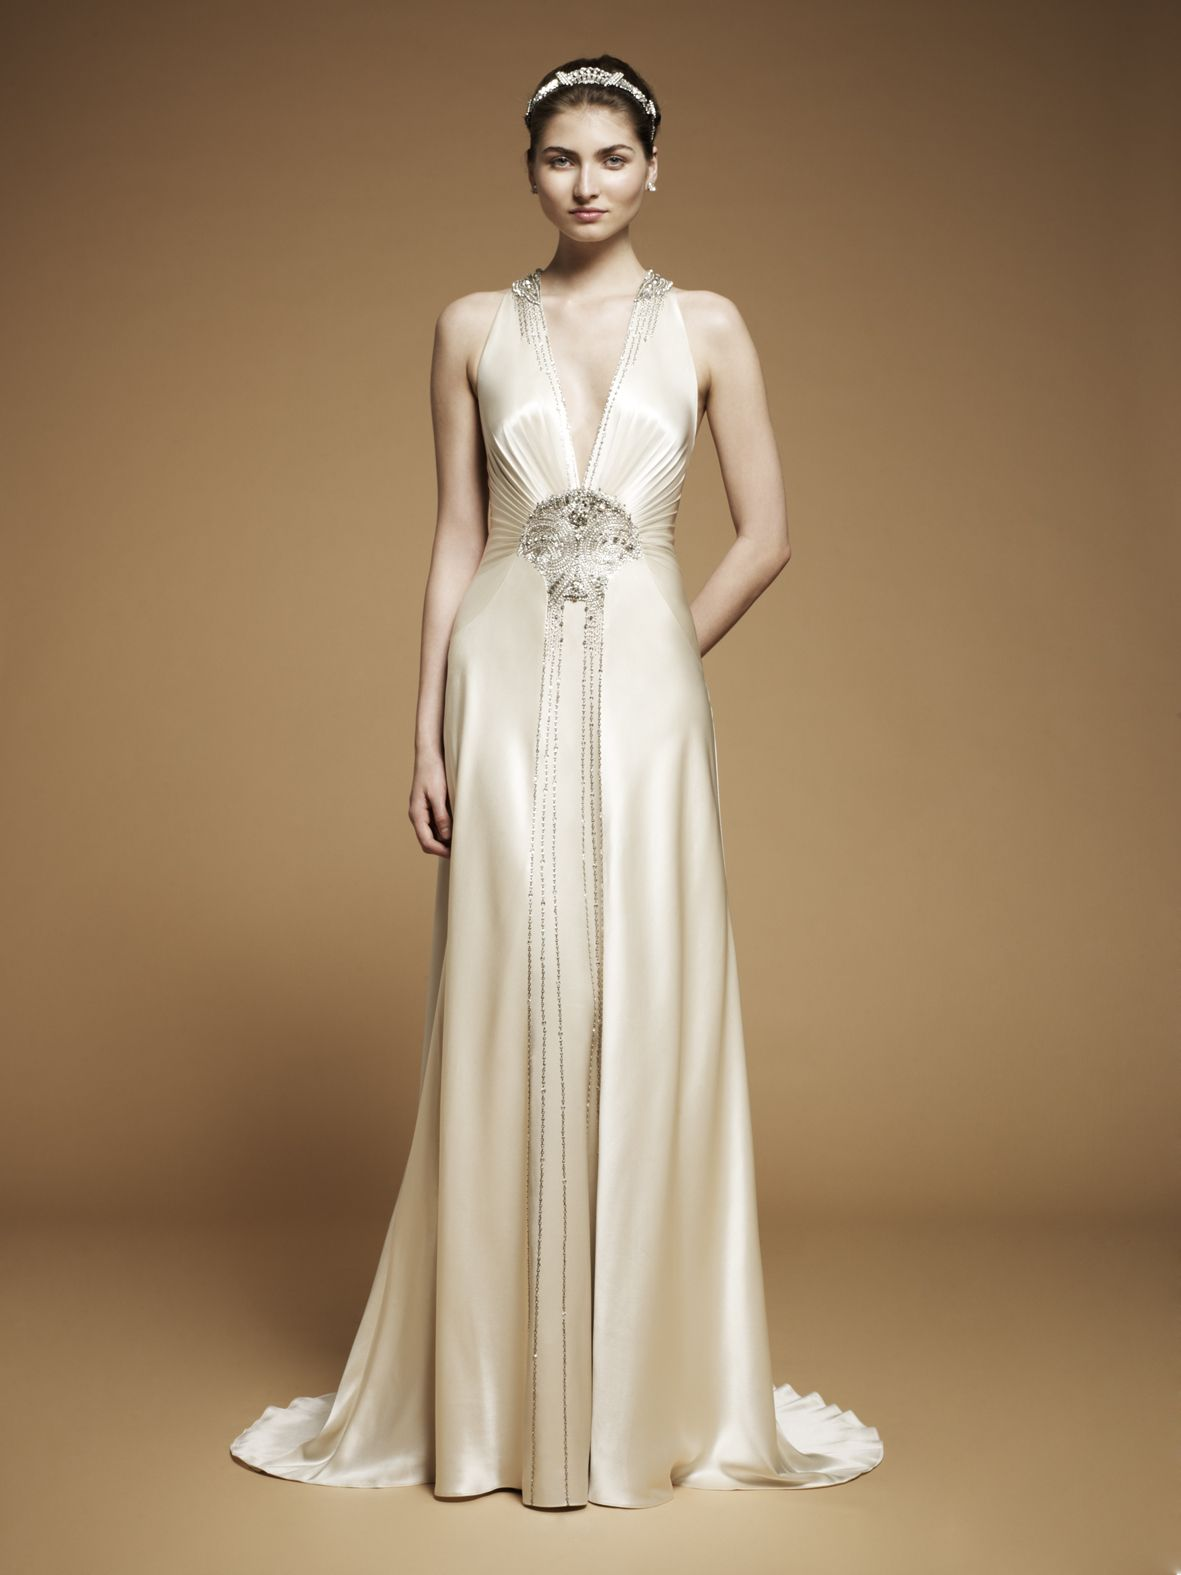 The Great Gatsby Art Deco Wedding Inspiration | Pinterest ...